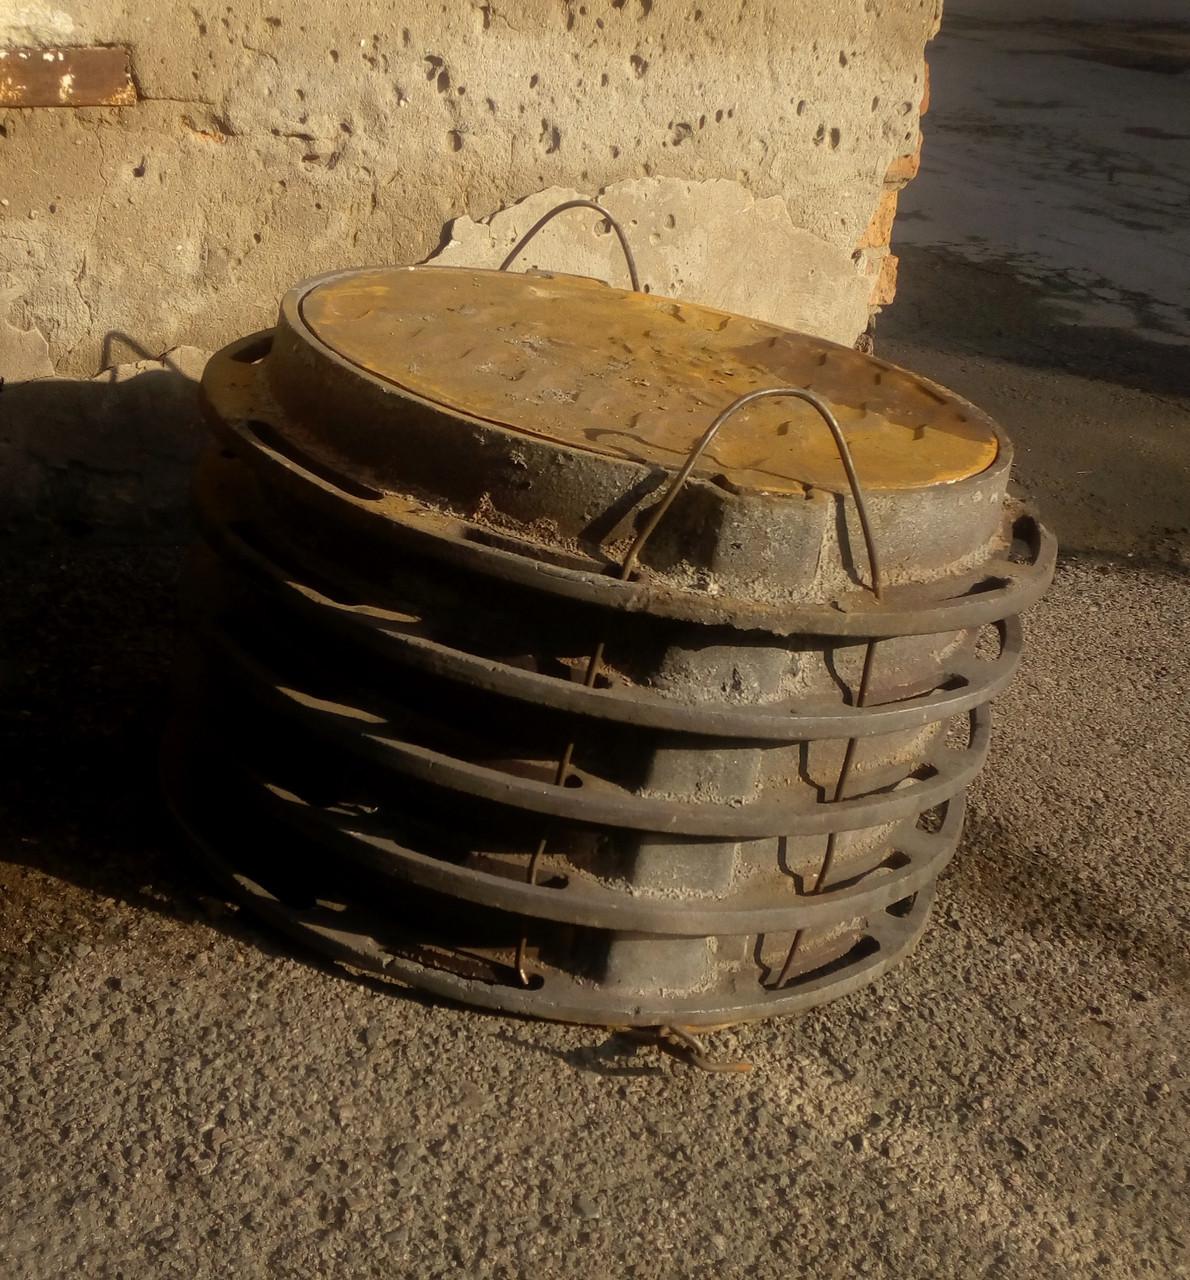 Люк чугунный, Тип С, круглый, ГОСТ 3634-99 нагрузка 12,5 тонны